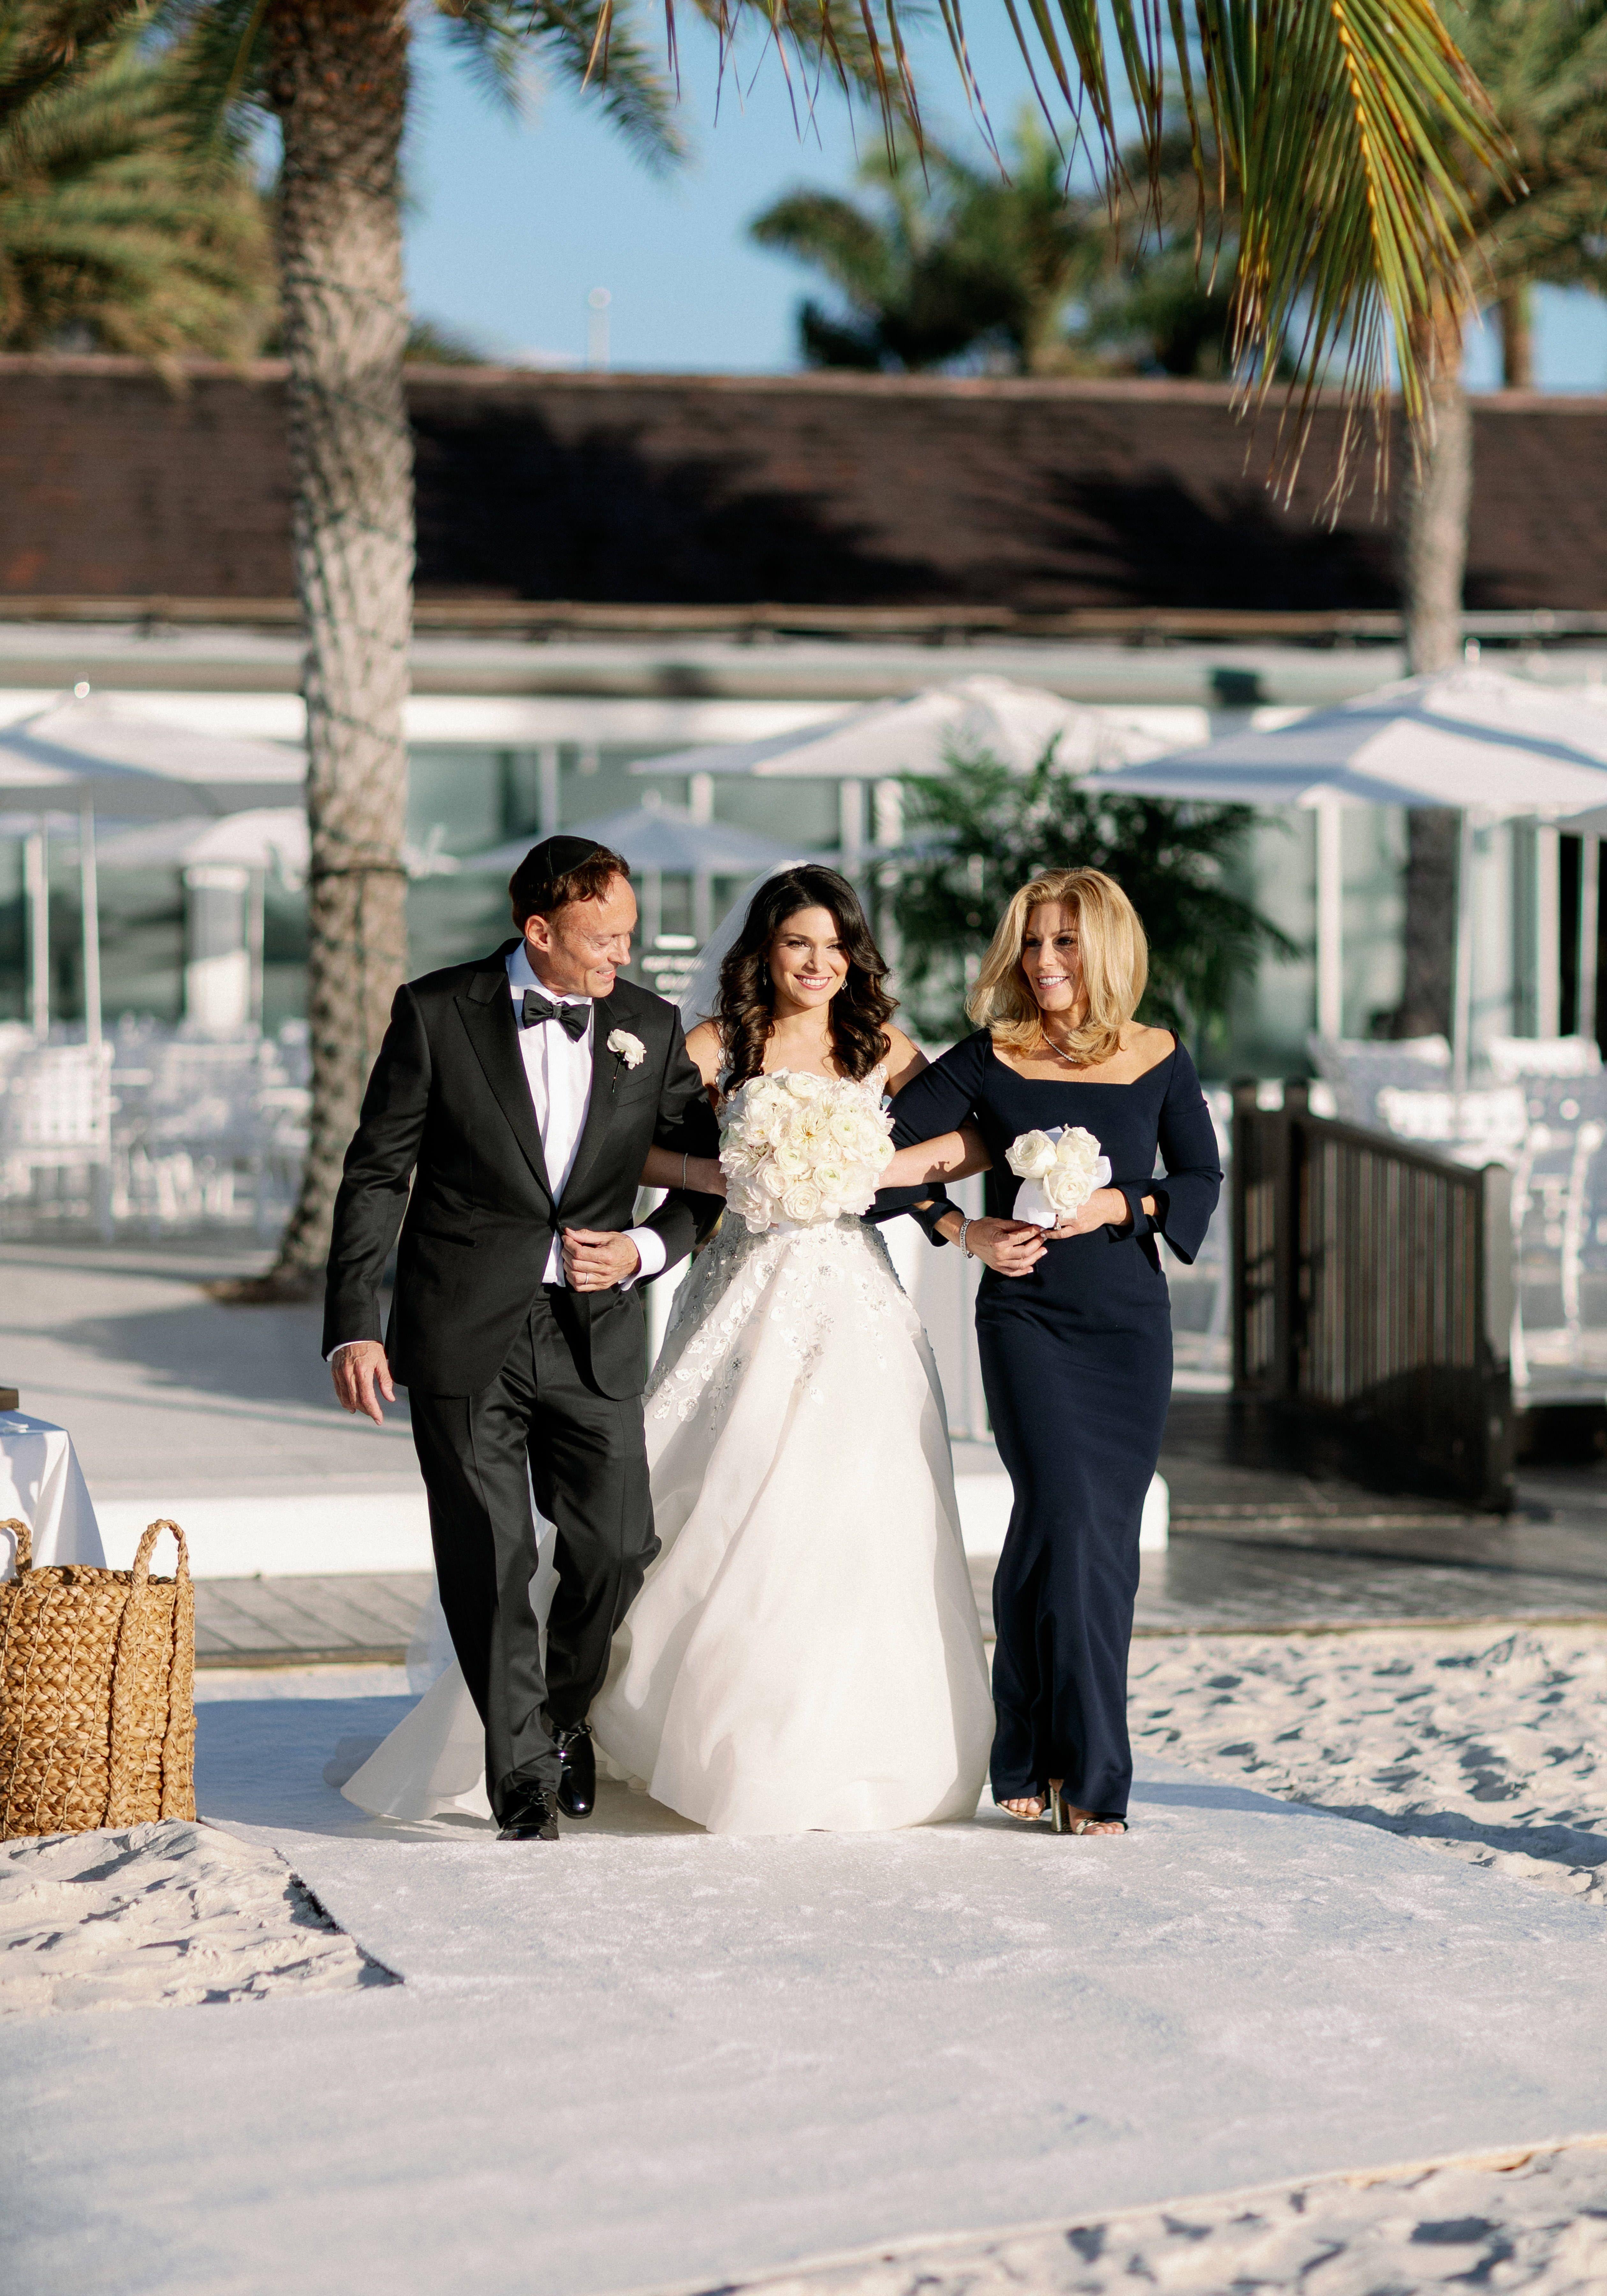 Bride Walking Down Aisle In 2020 Destination Wedding Planner Destination Wedding Bride